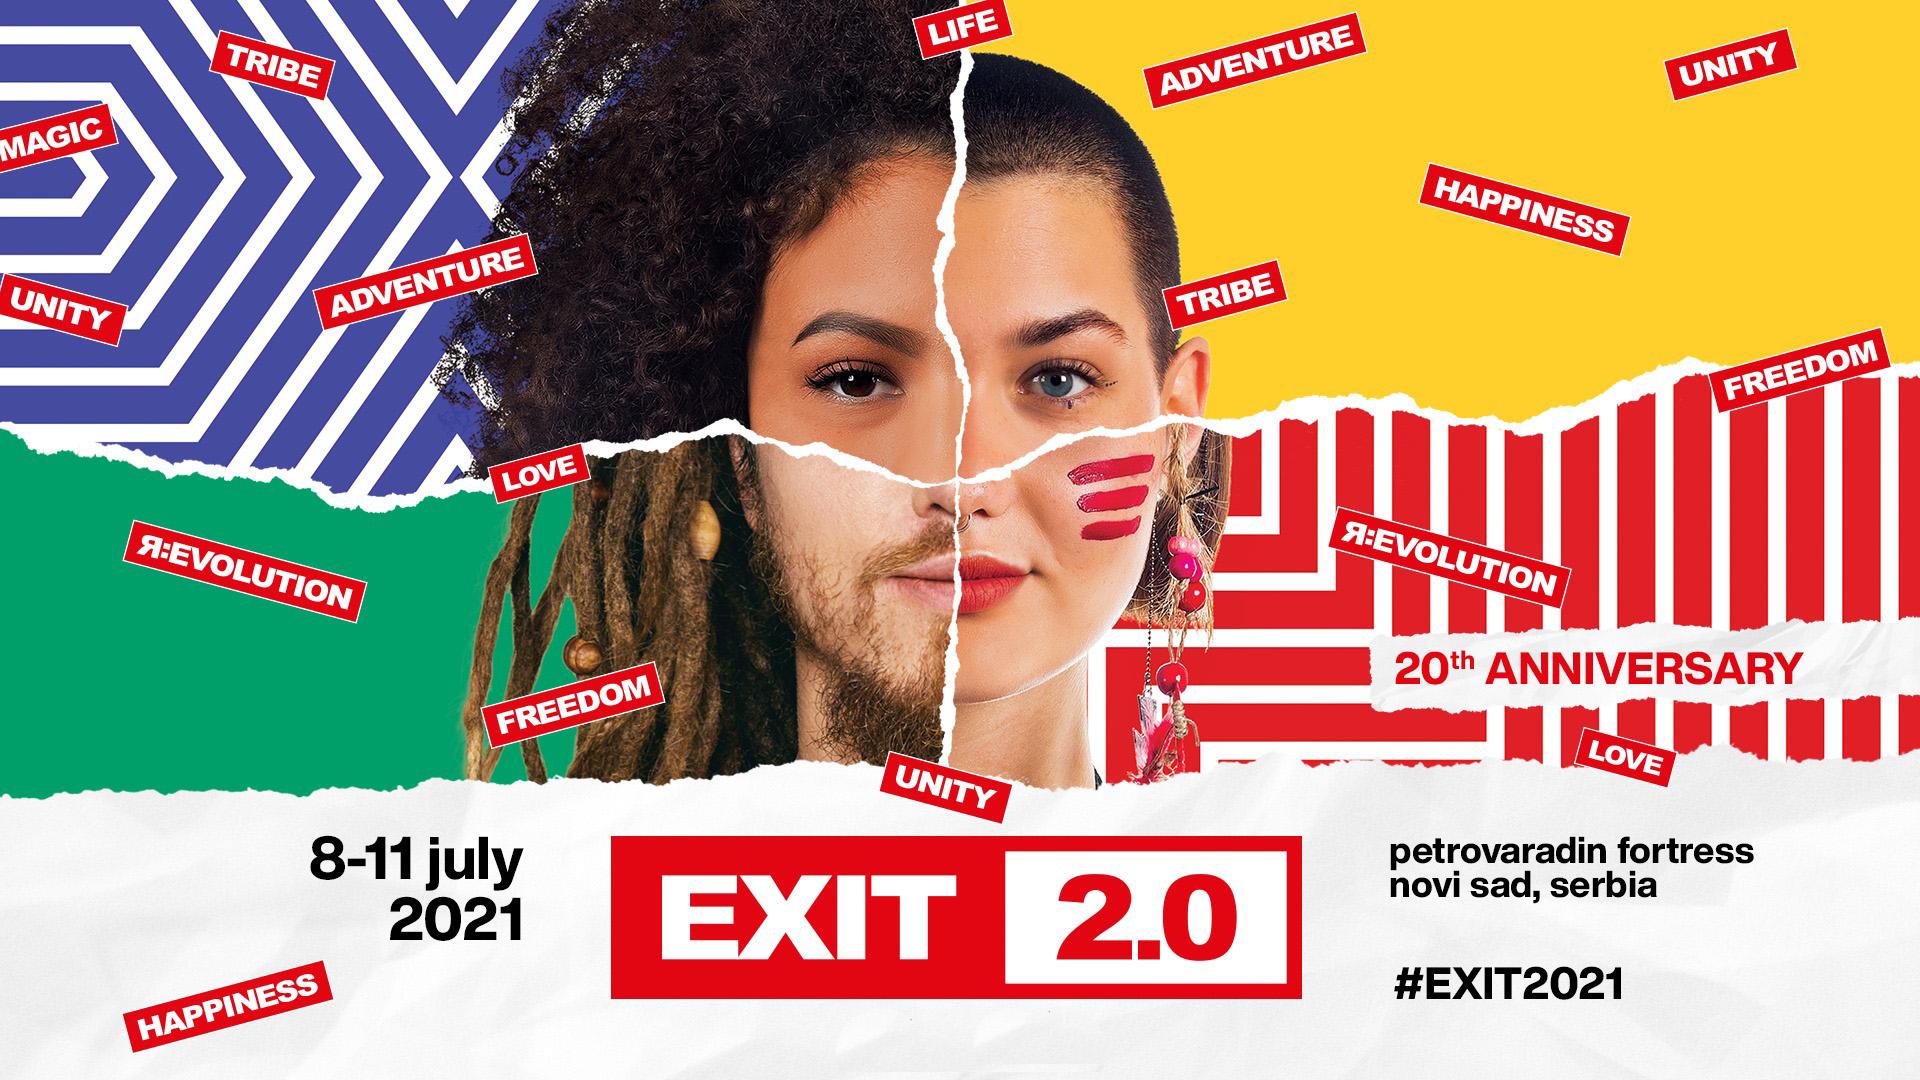 exit festival 2021 8 11 luglio 2021